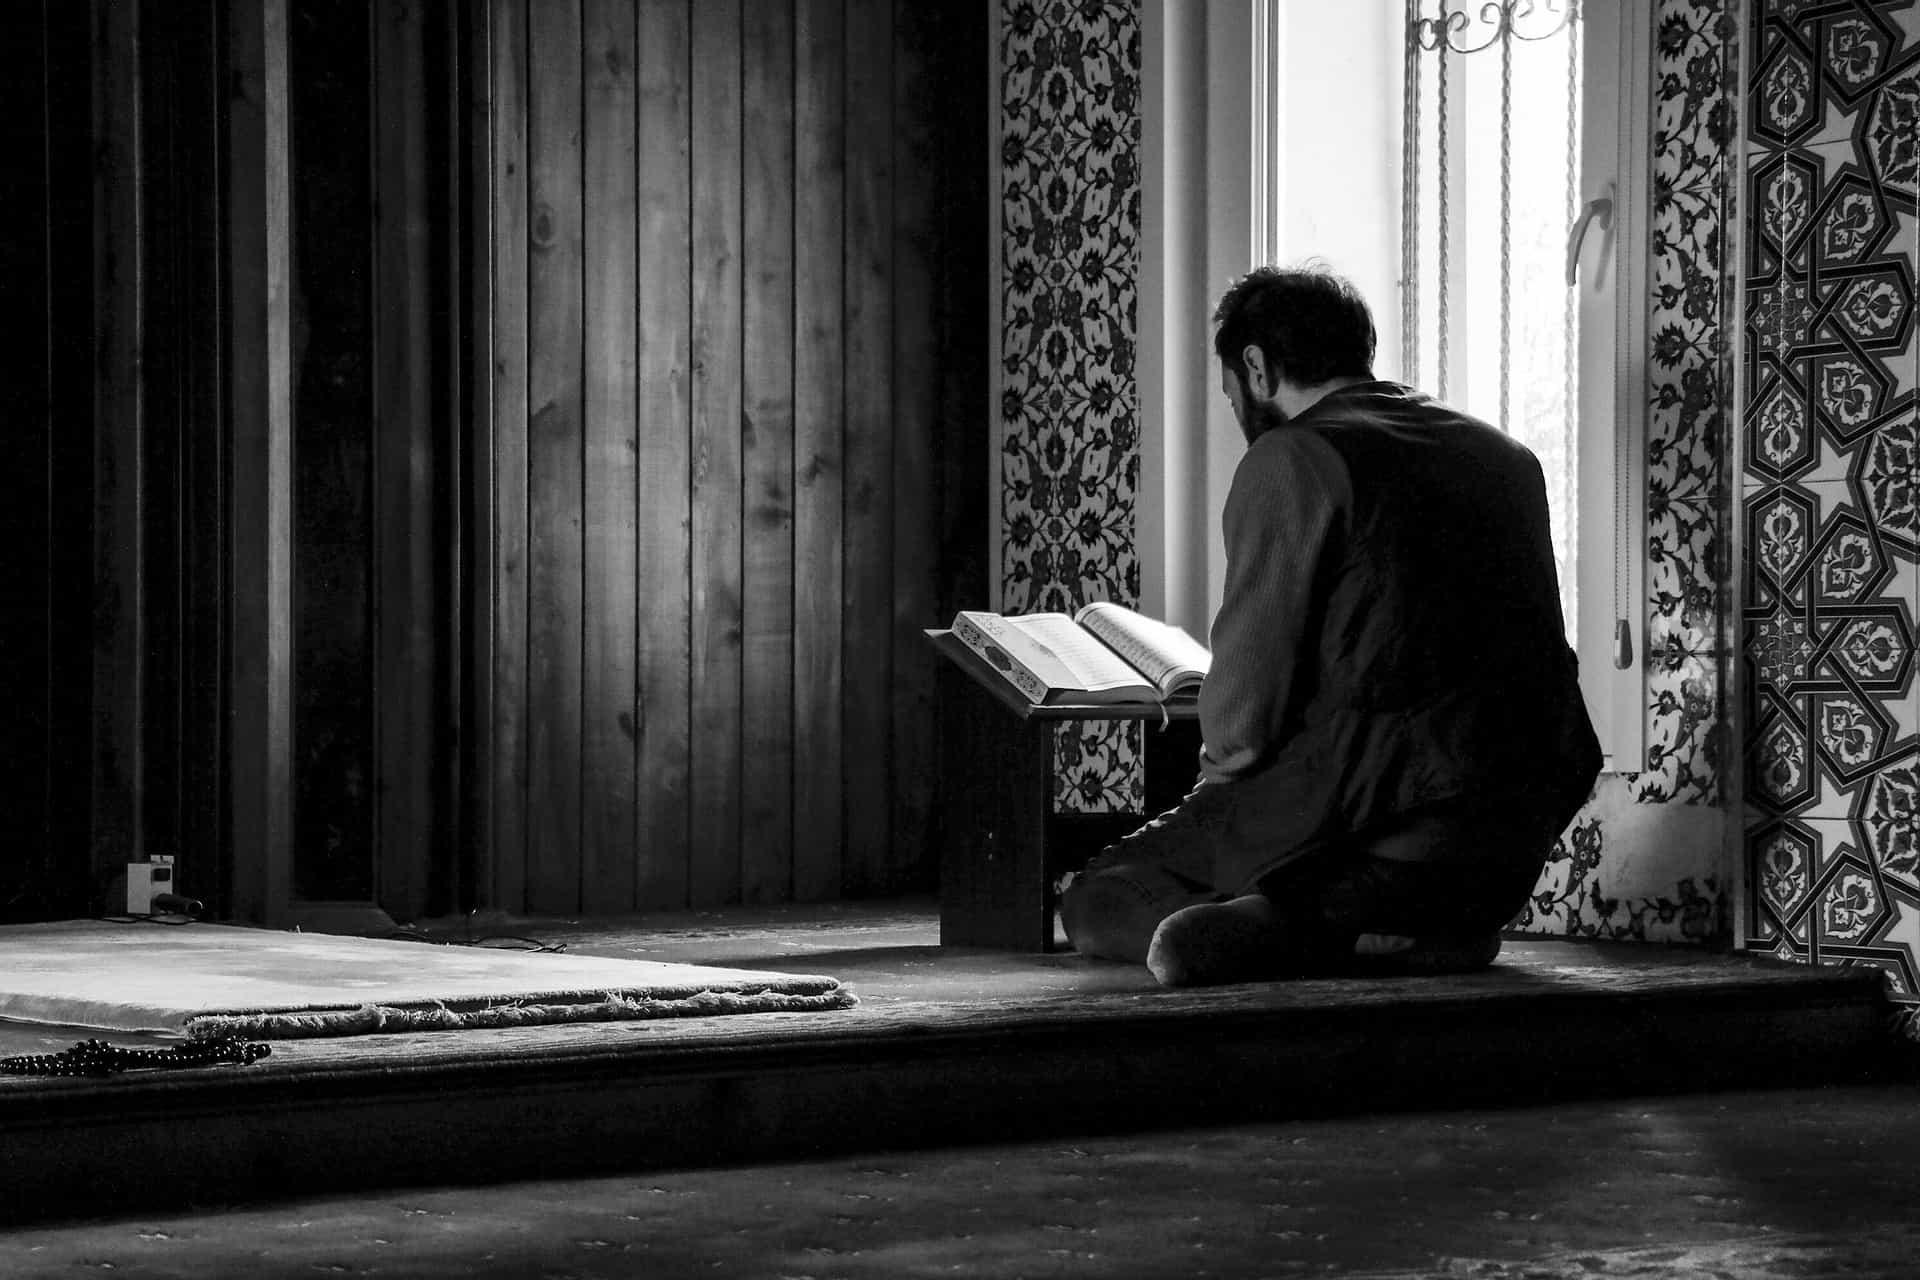 Kisah Teladan Nabi Muhammad Sang Motivator Laz Dompet Dhuafa